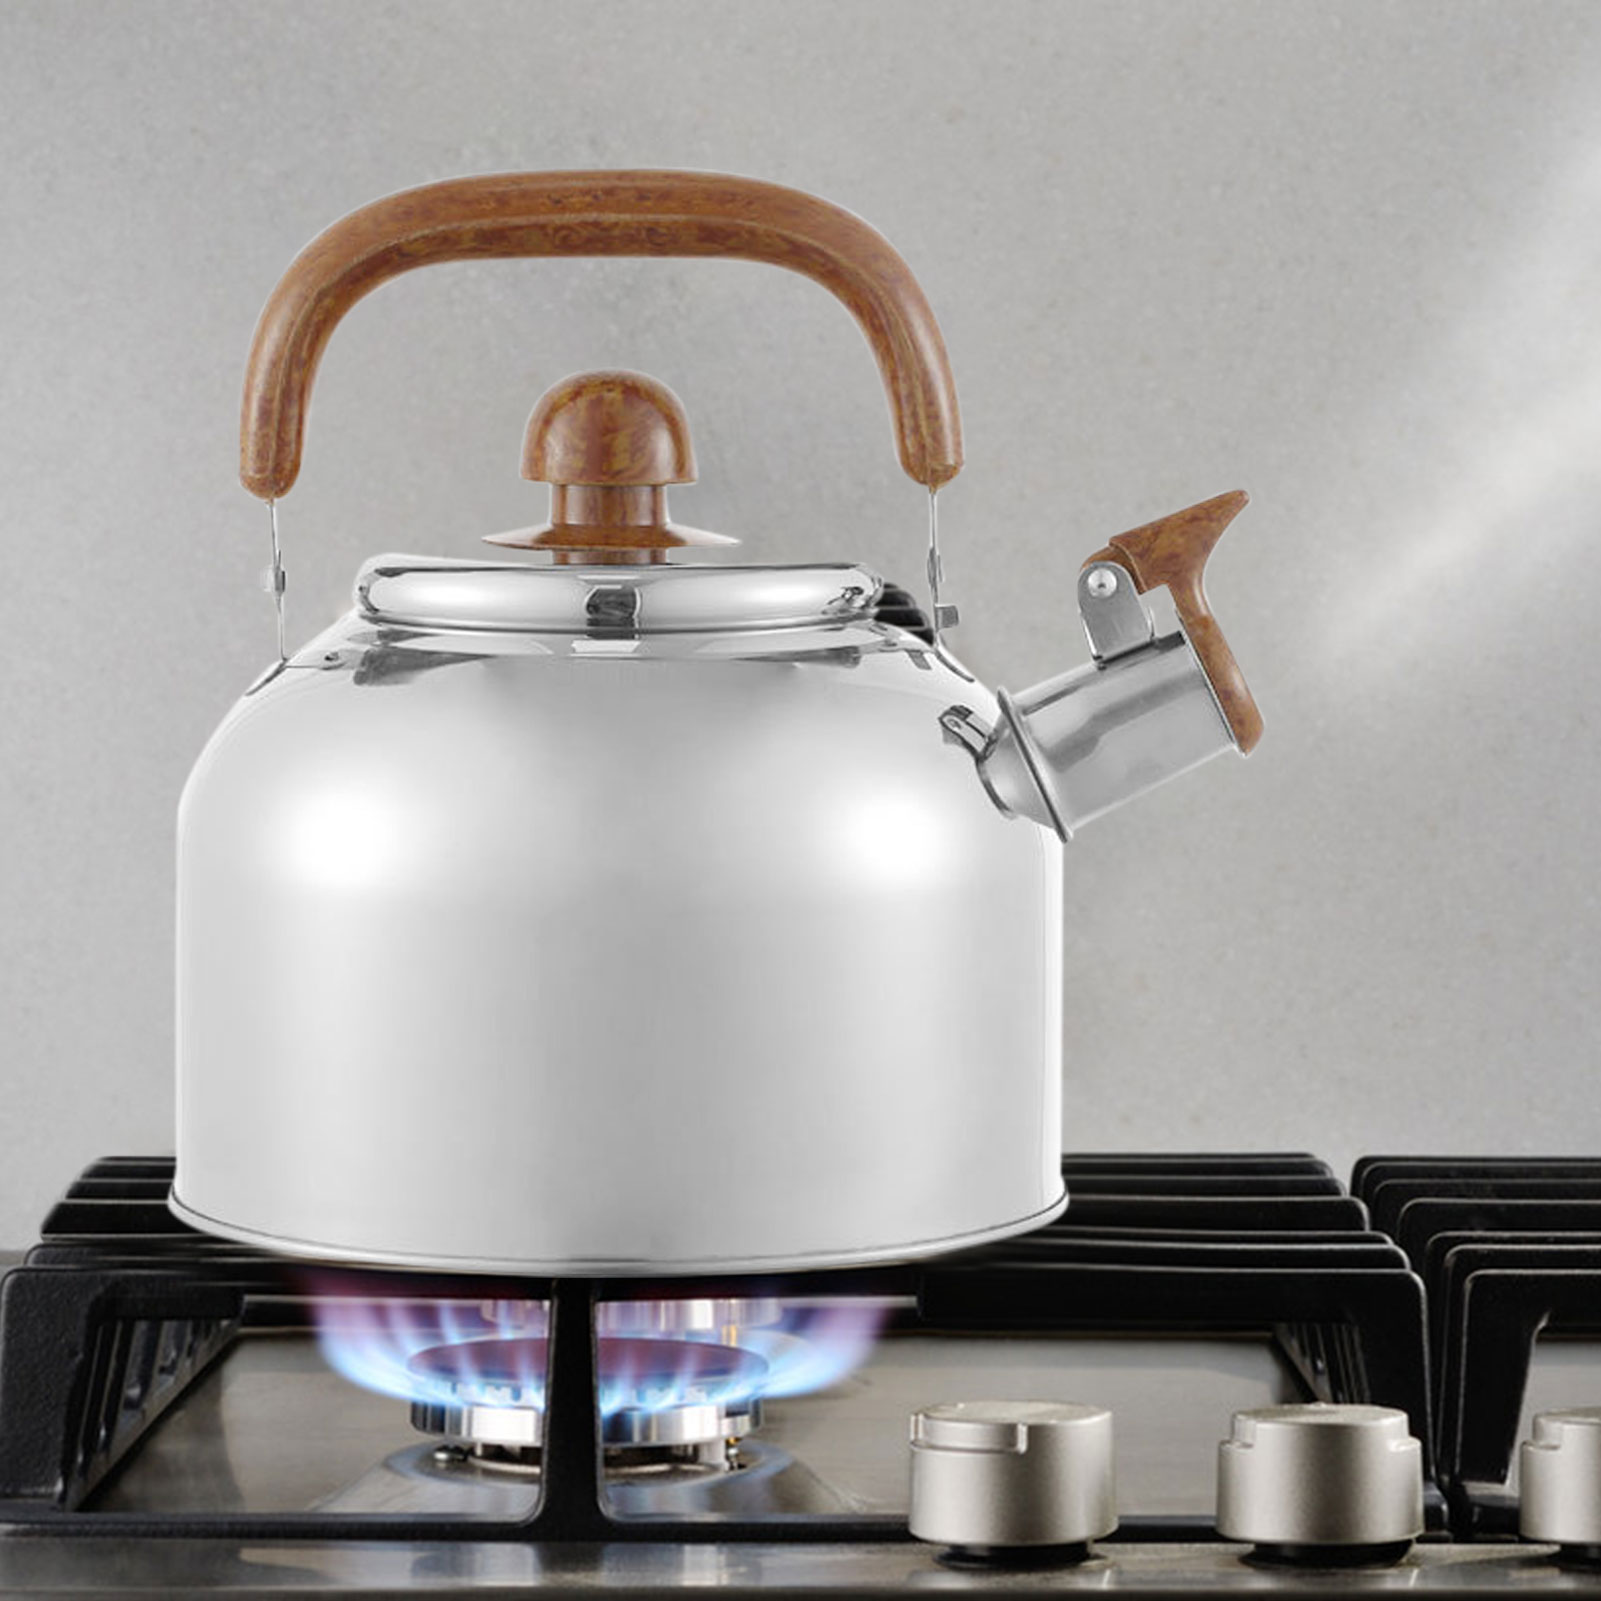 3L غلاية الفولاذ المقاوم للصدأ السبر سعة كبيرة صافرة الغاز الغاز التعريفي طباخ إبريق الشاي غلاية معدنية براد شاي مخيم المطبخ